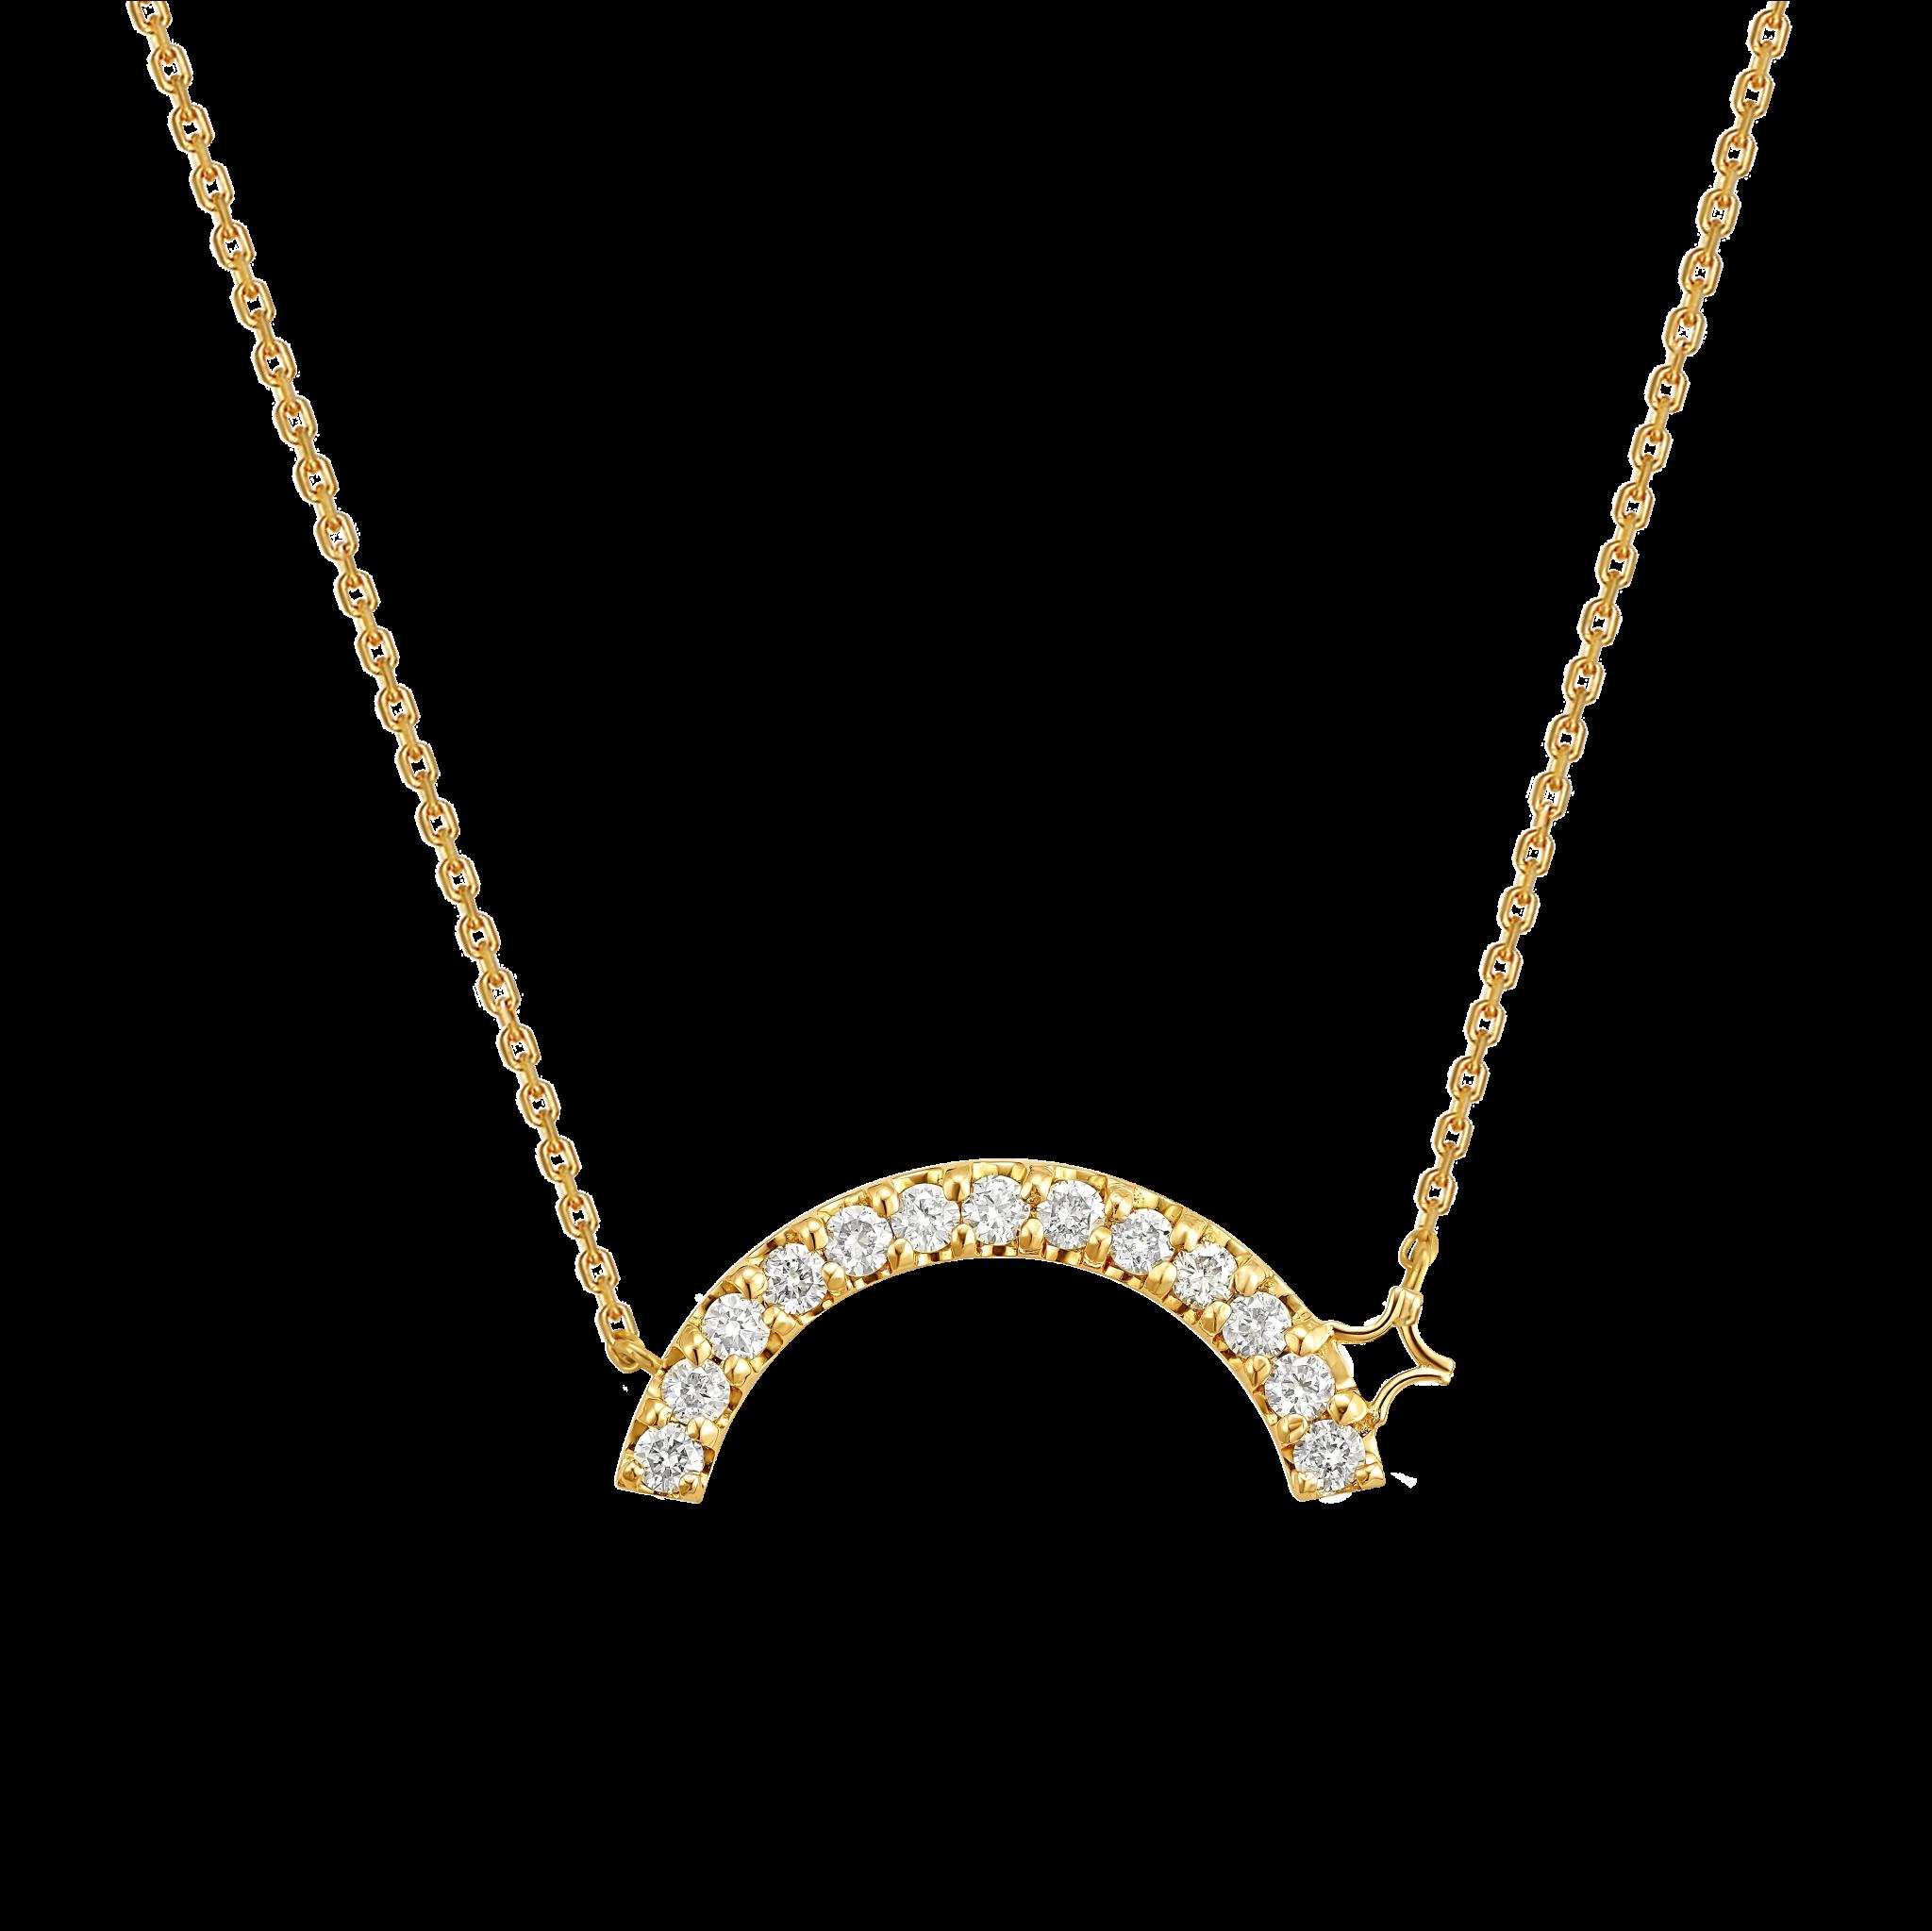 Beyond the Arc Collection 18K黄金 钻石项链-女神版 6399